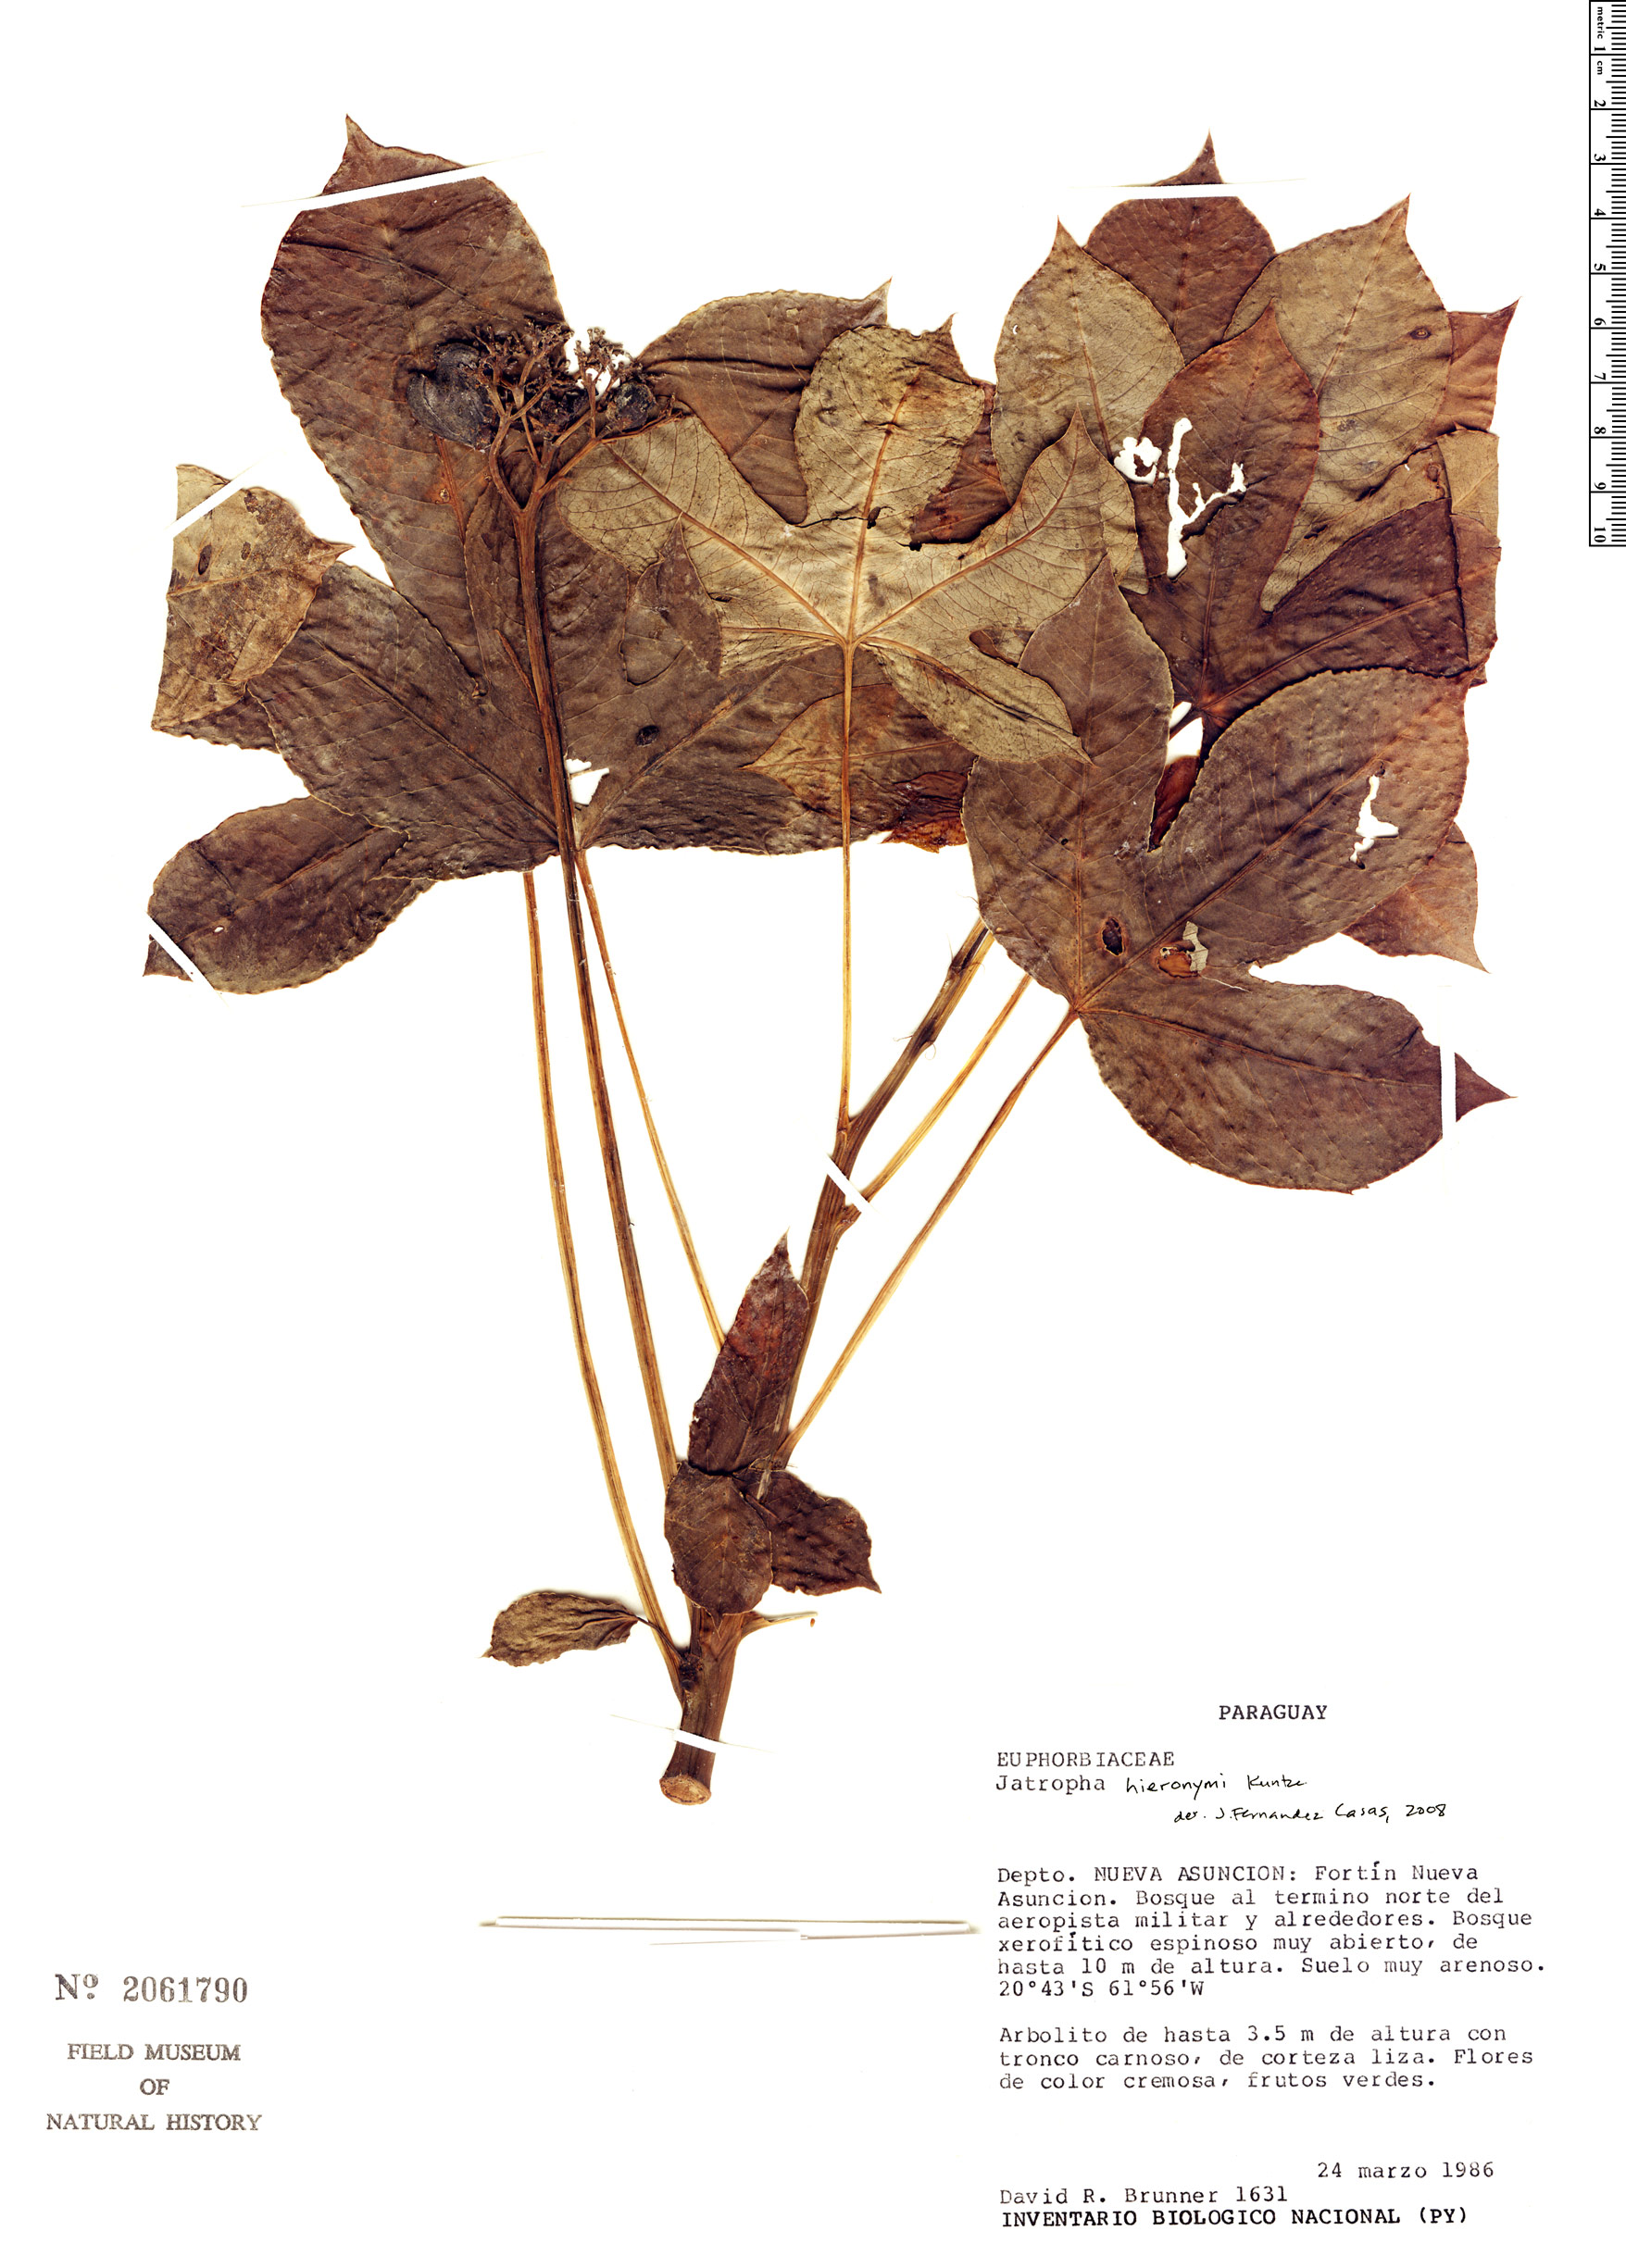 Specimen: Jatropha hieronymi